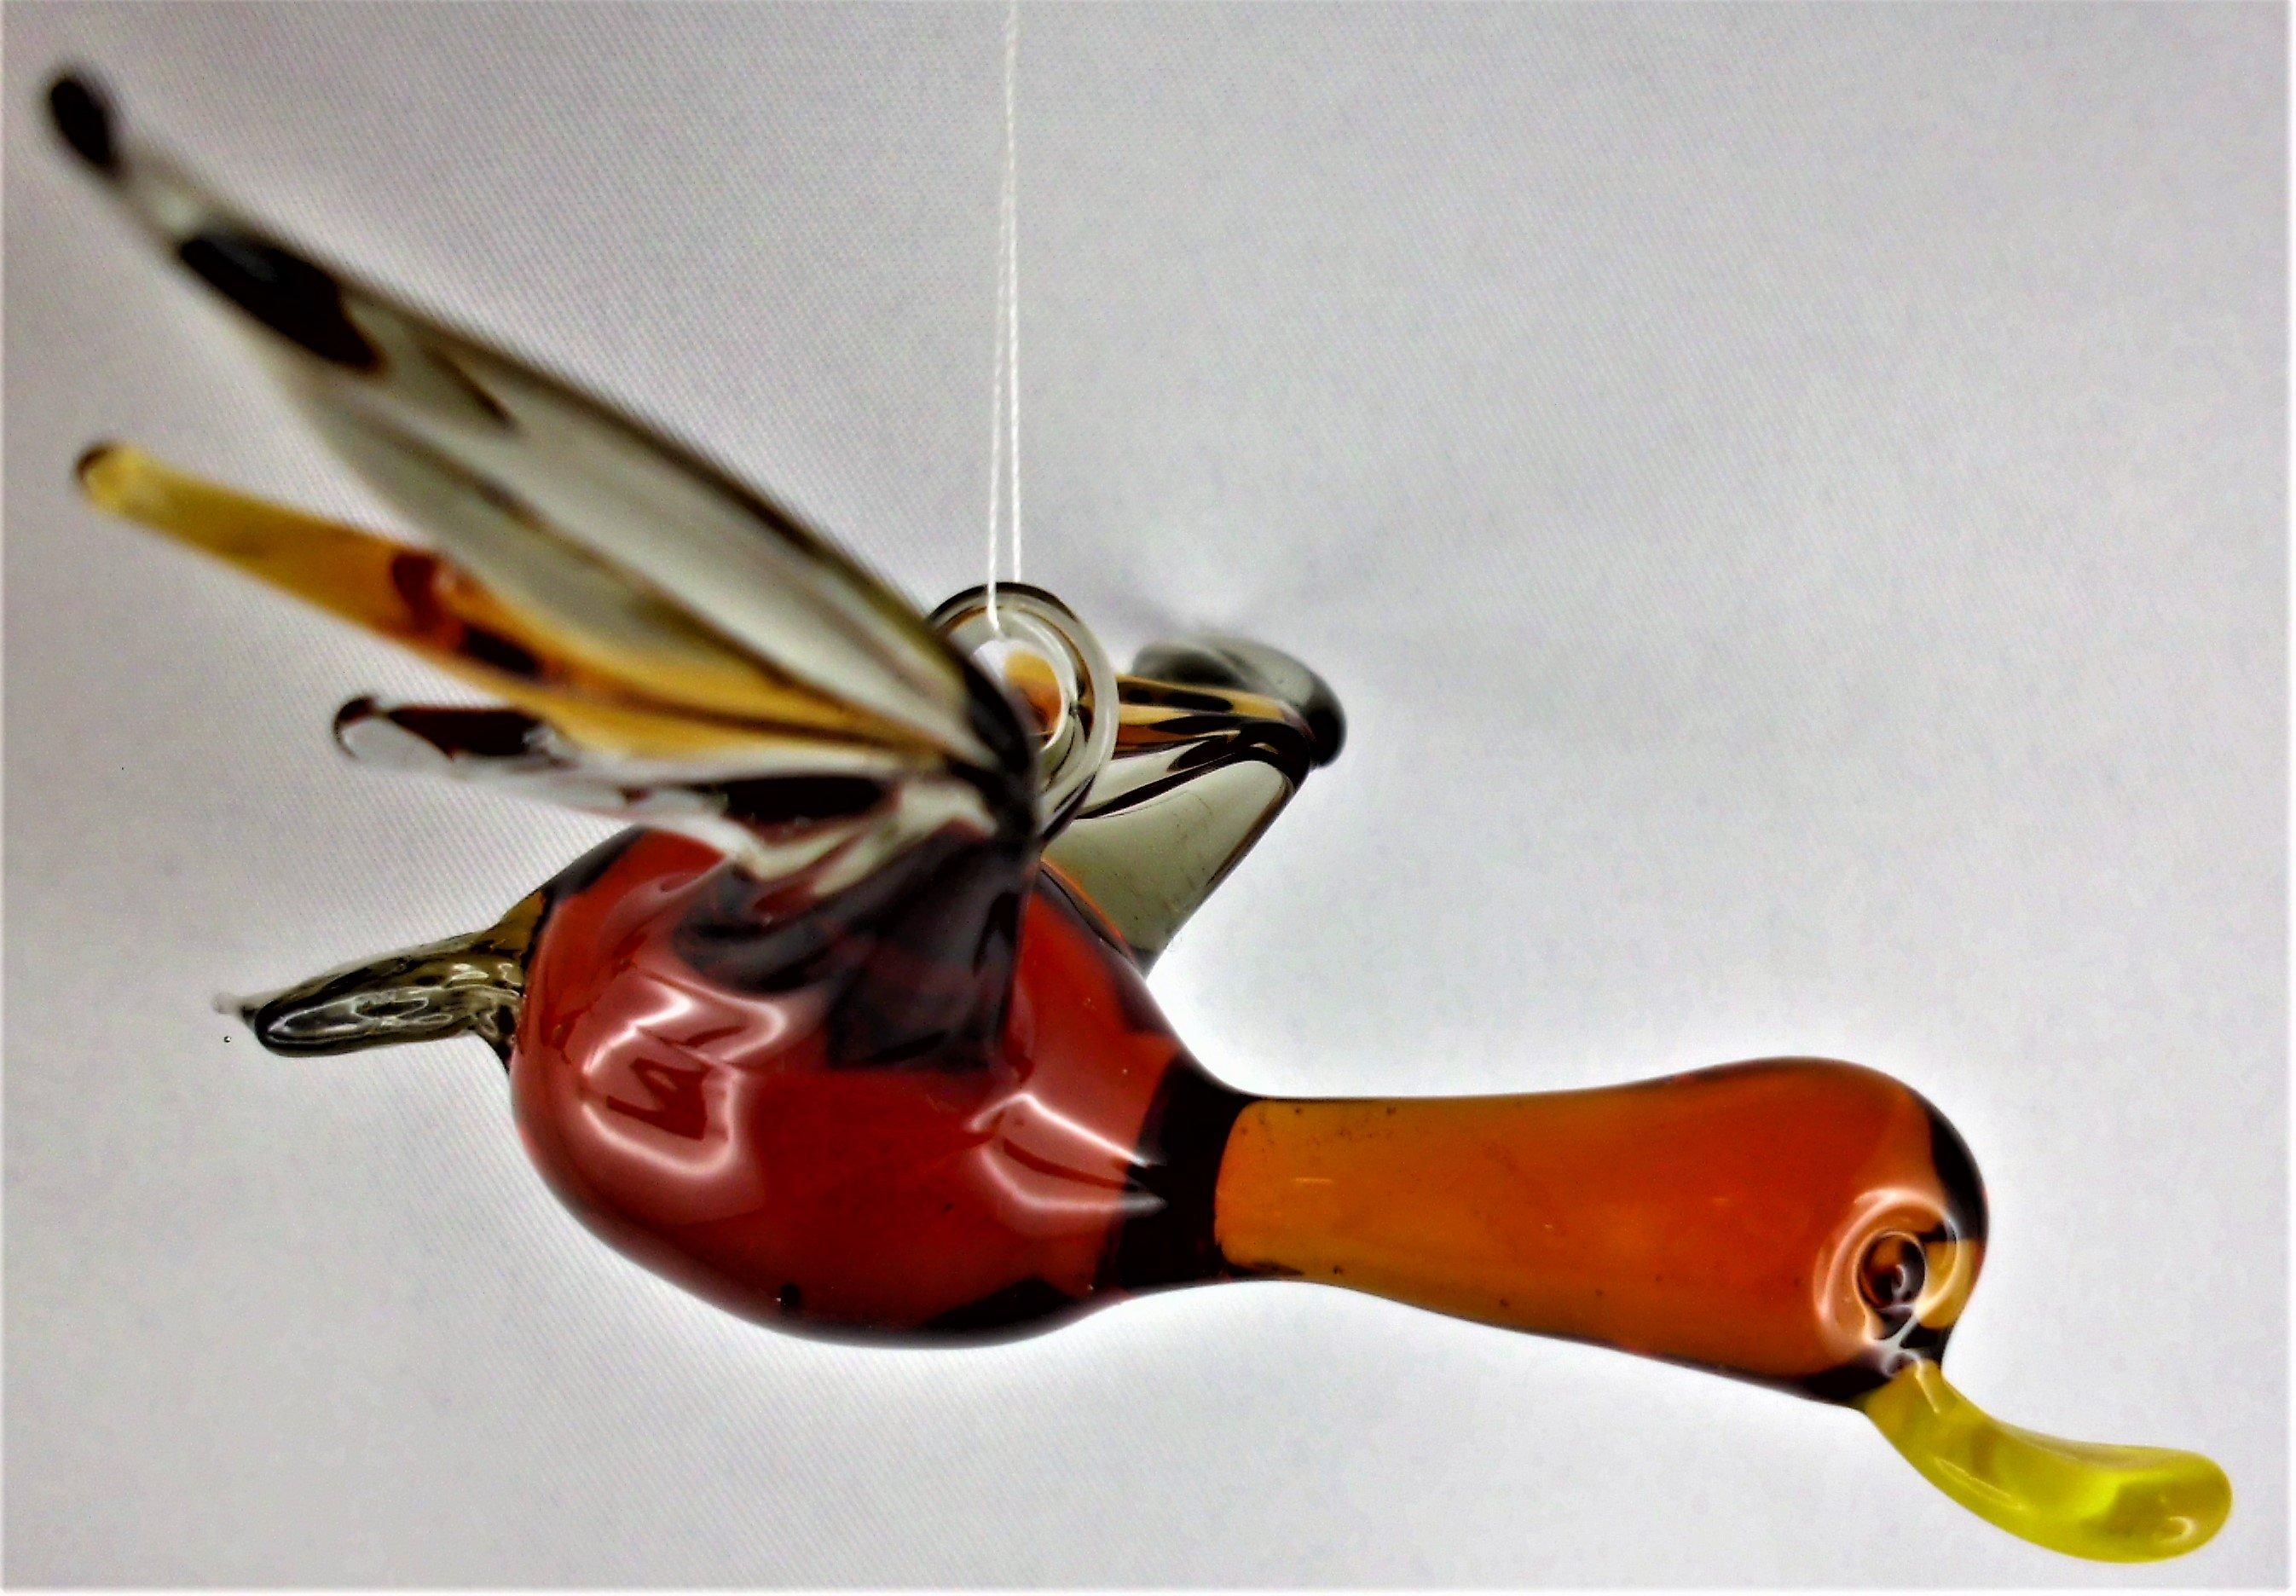 Vögel zum Aufhängen 2 | glaskuenstlerin.de